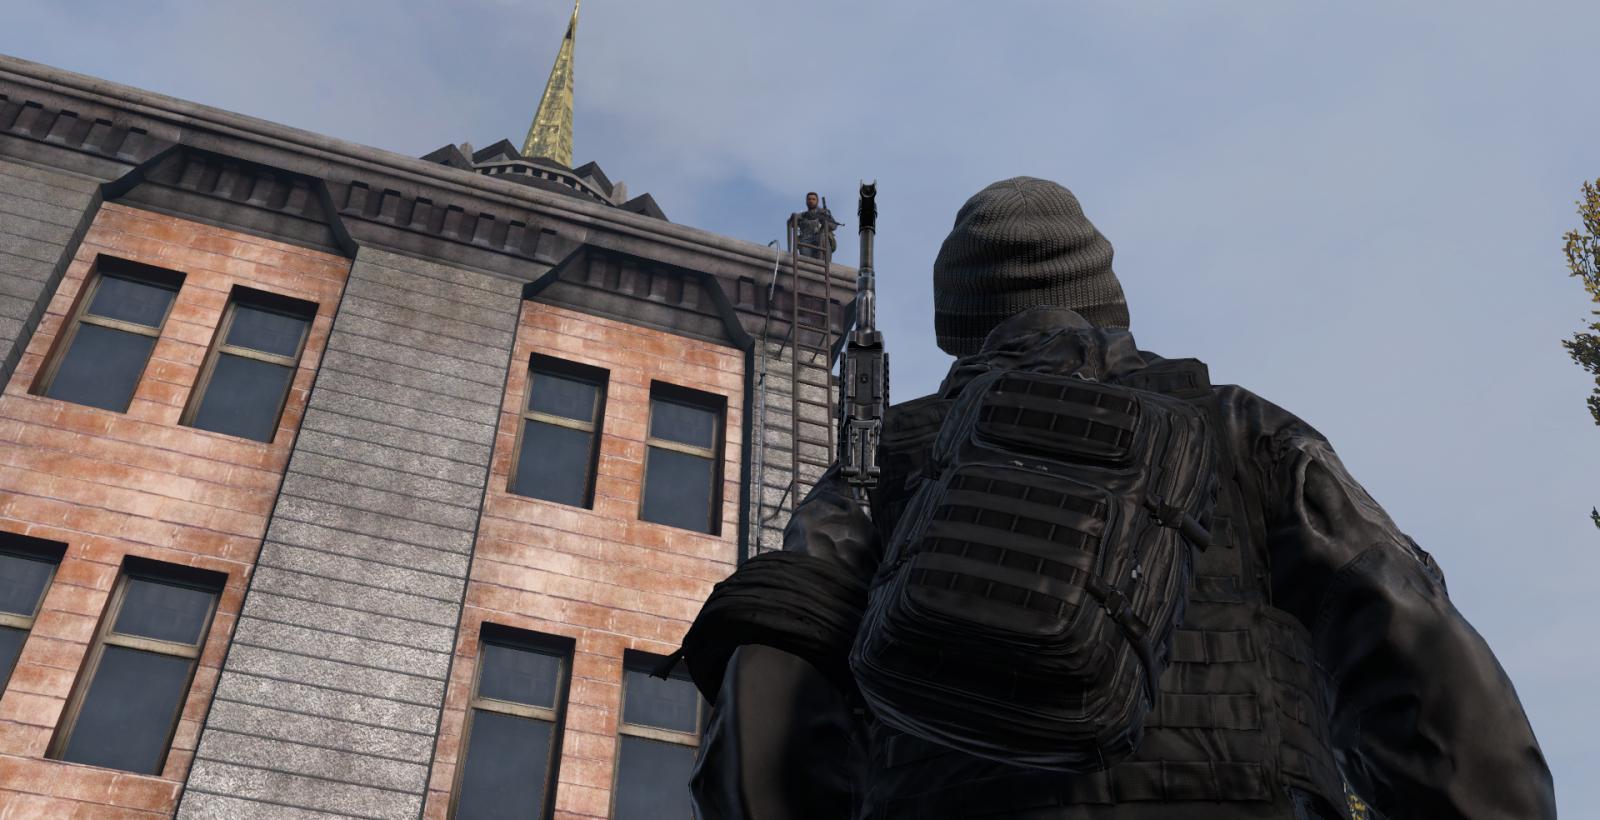 Crazy german sniper